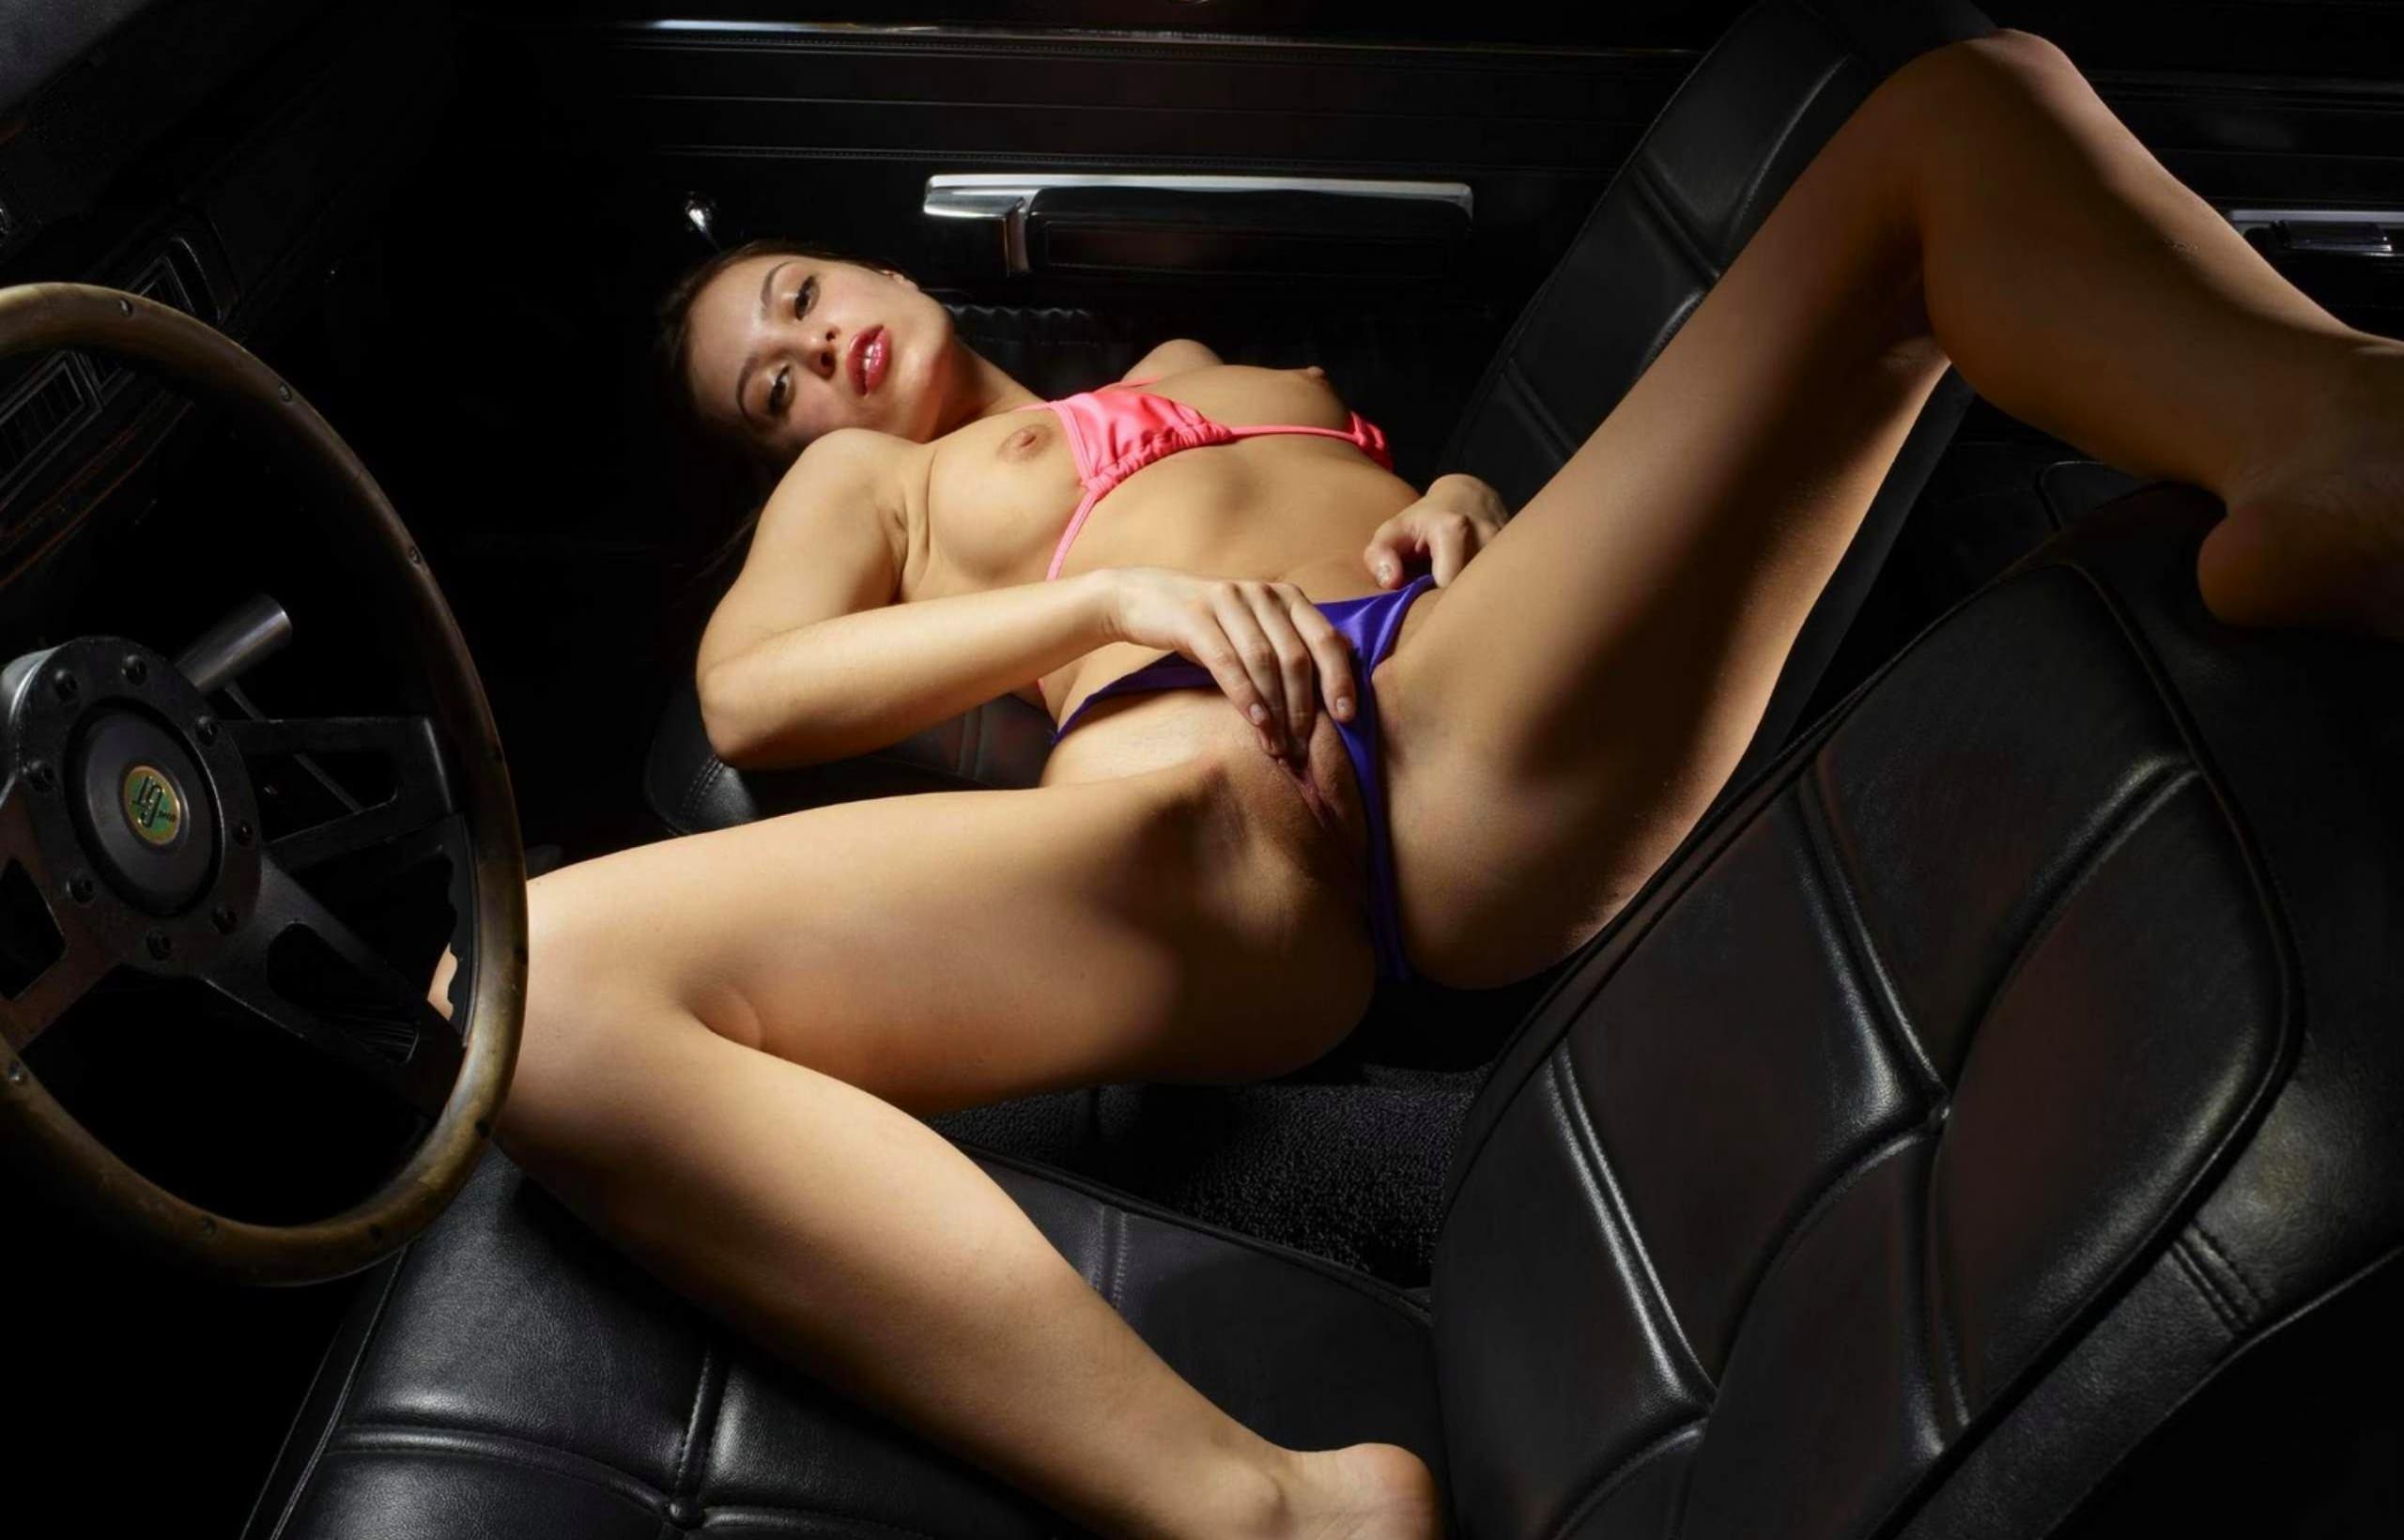 Sara_fun squirting in the car